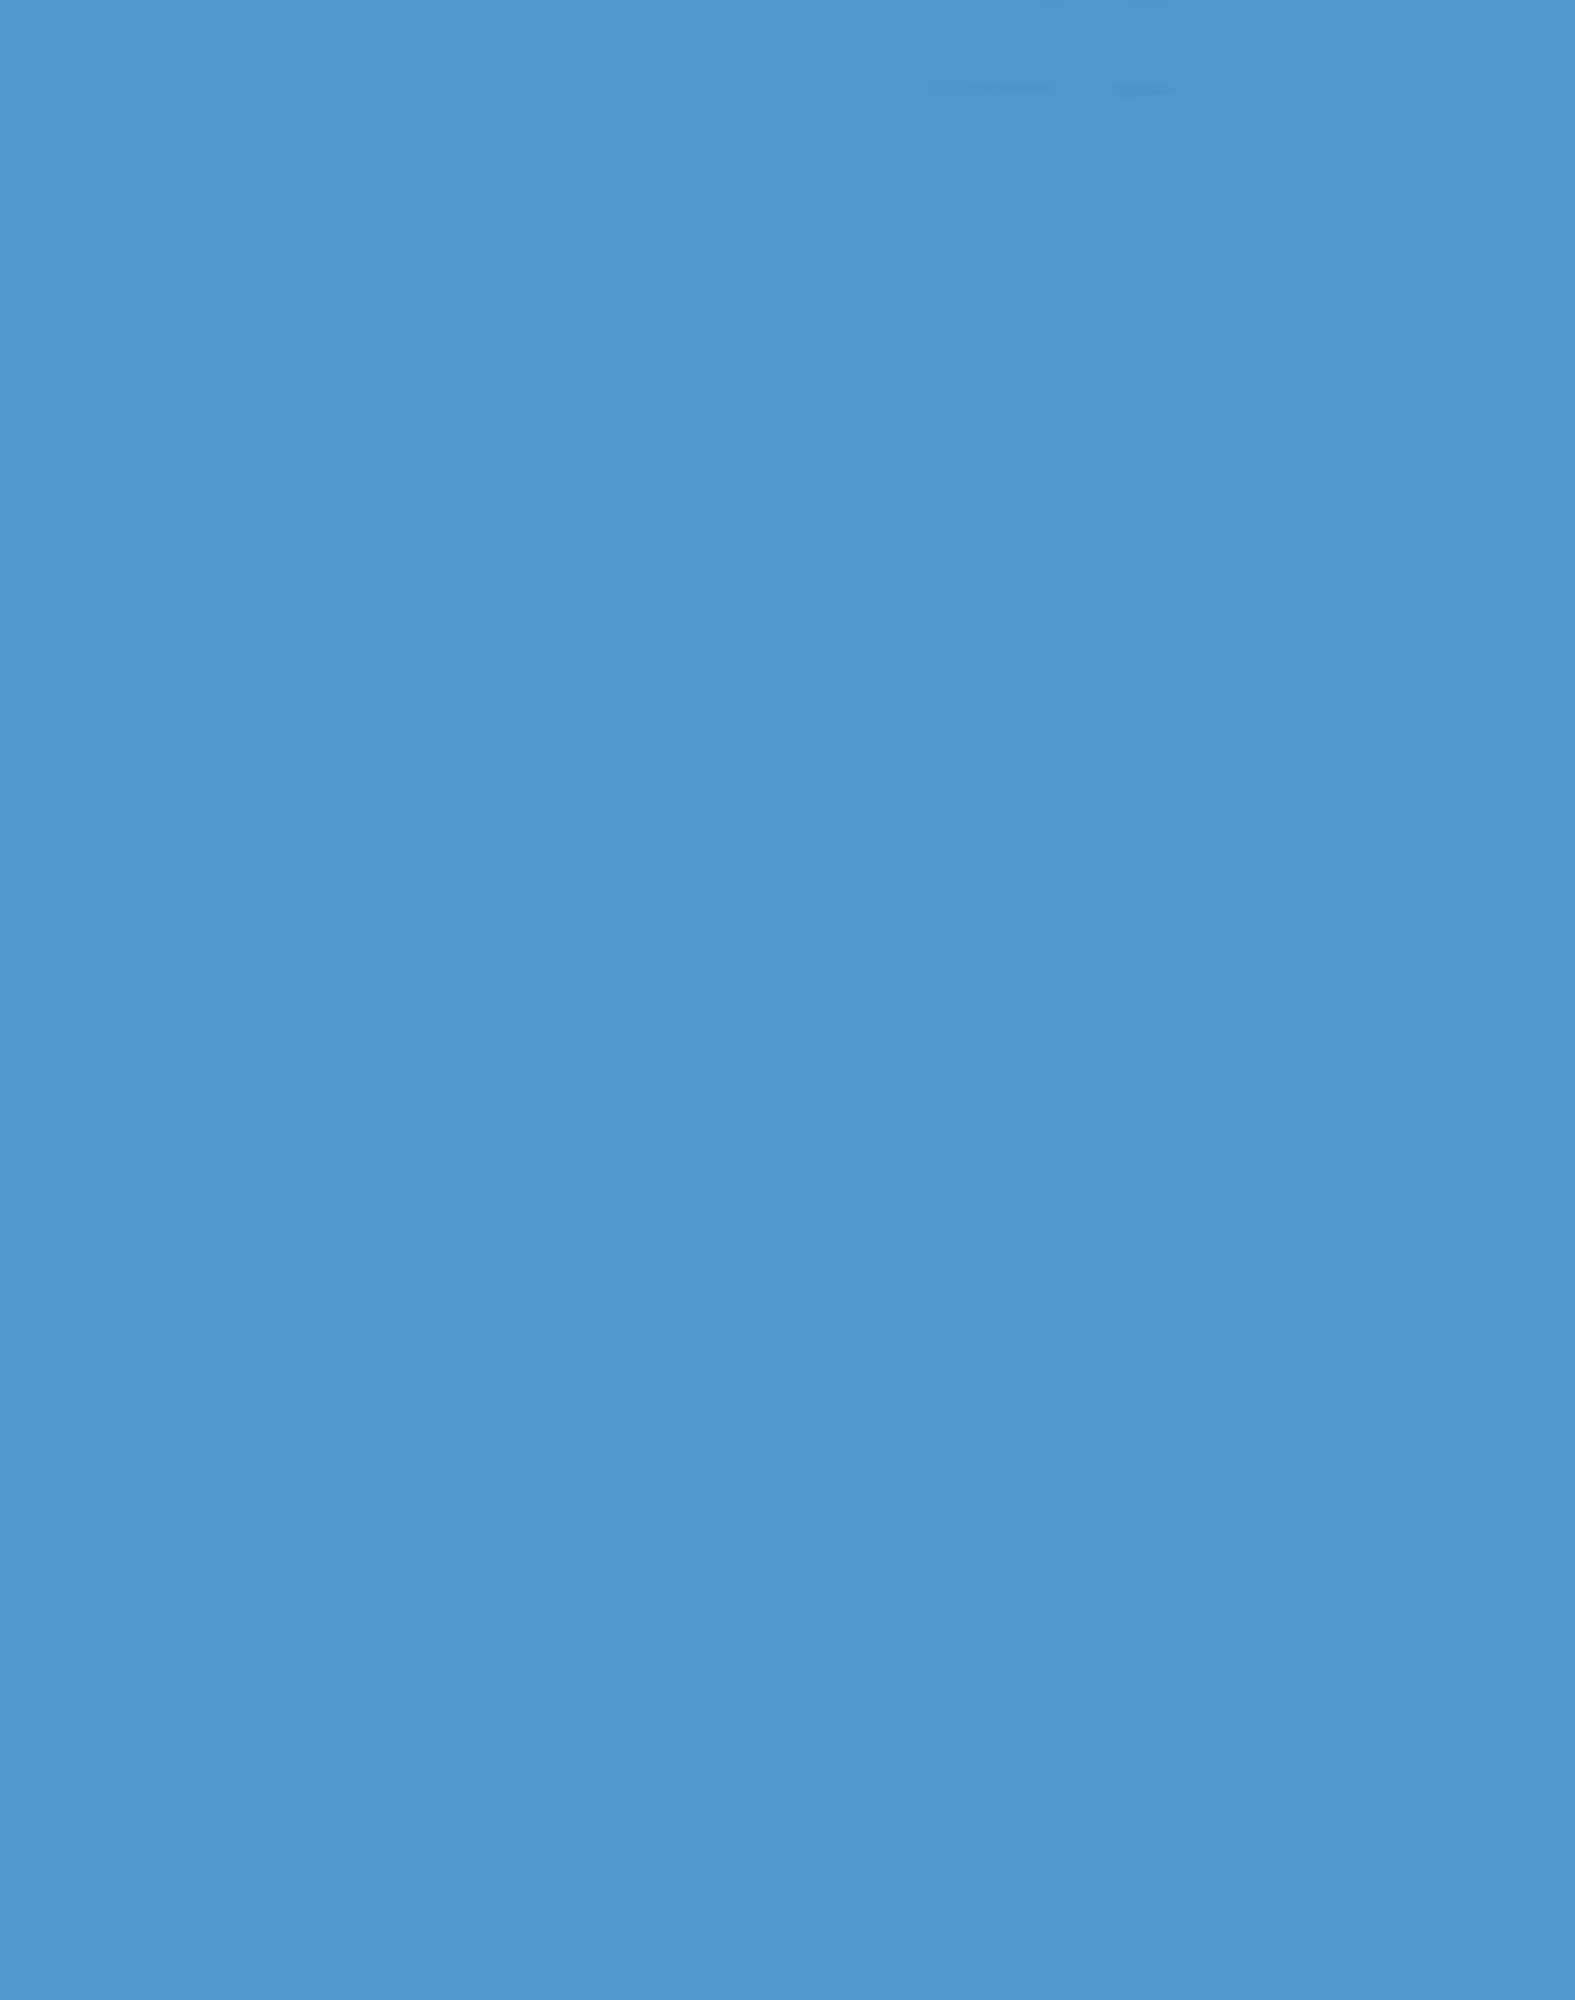 Blue Star 77,153,206